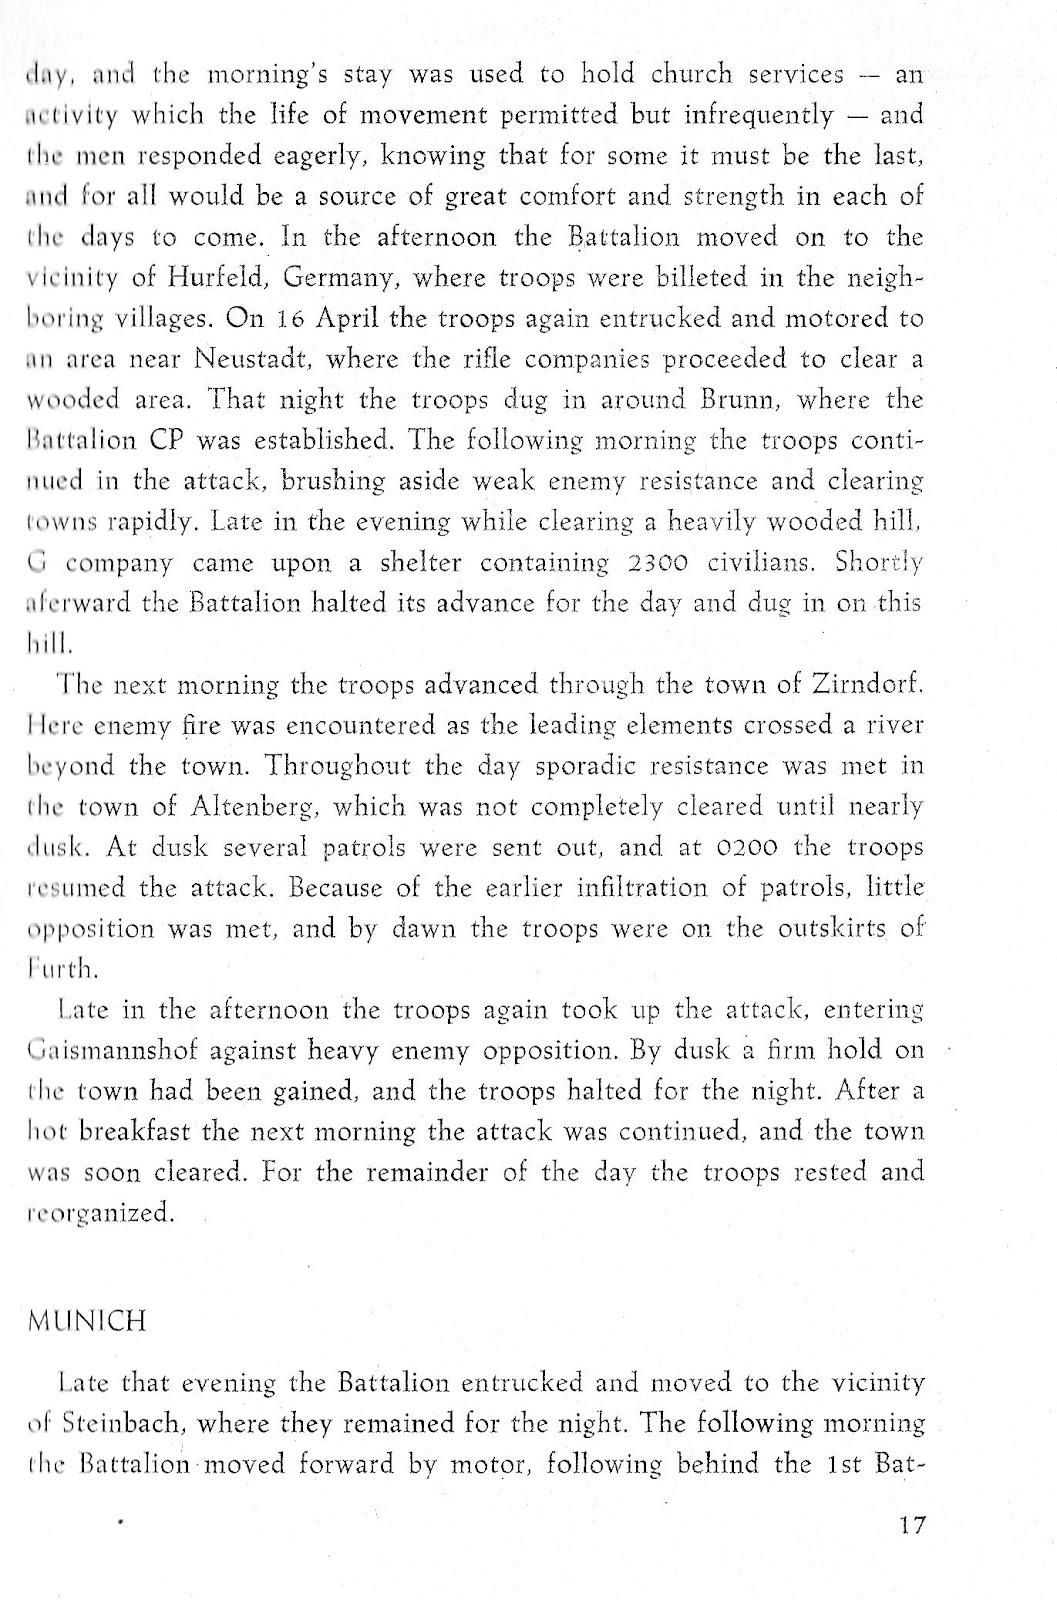 History pg17.jpg